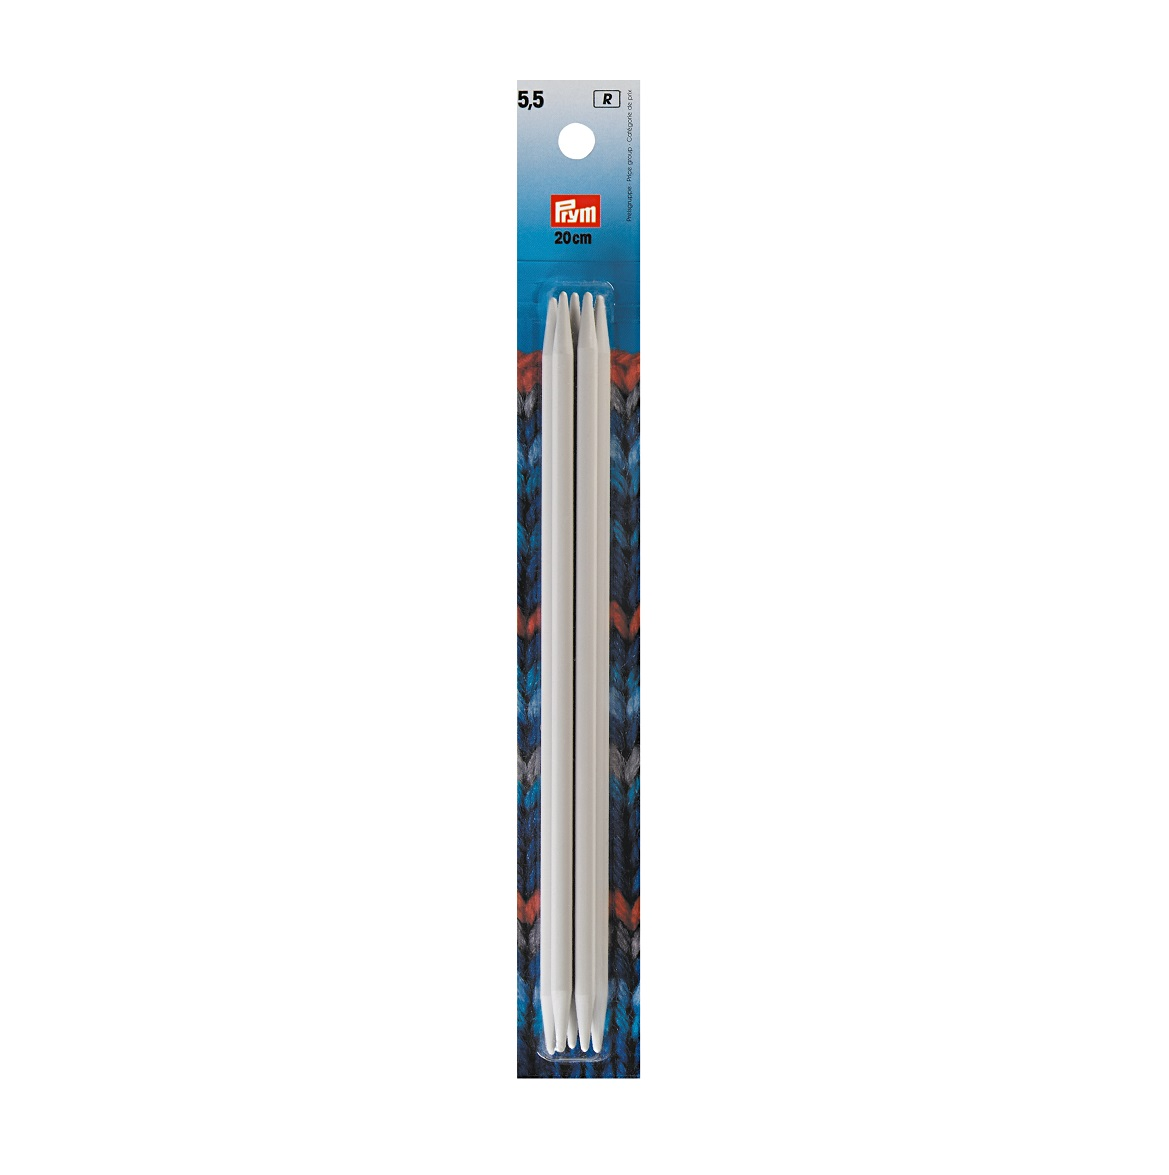 Strumpfstricknadeln, metall, 20 cm, 5,50 mm. Prym 218643